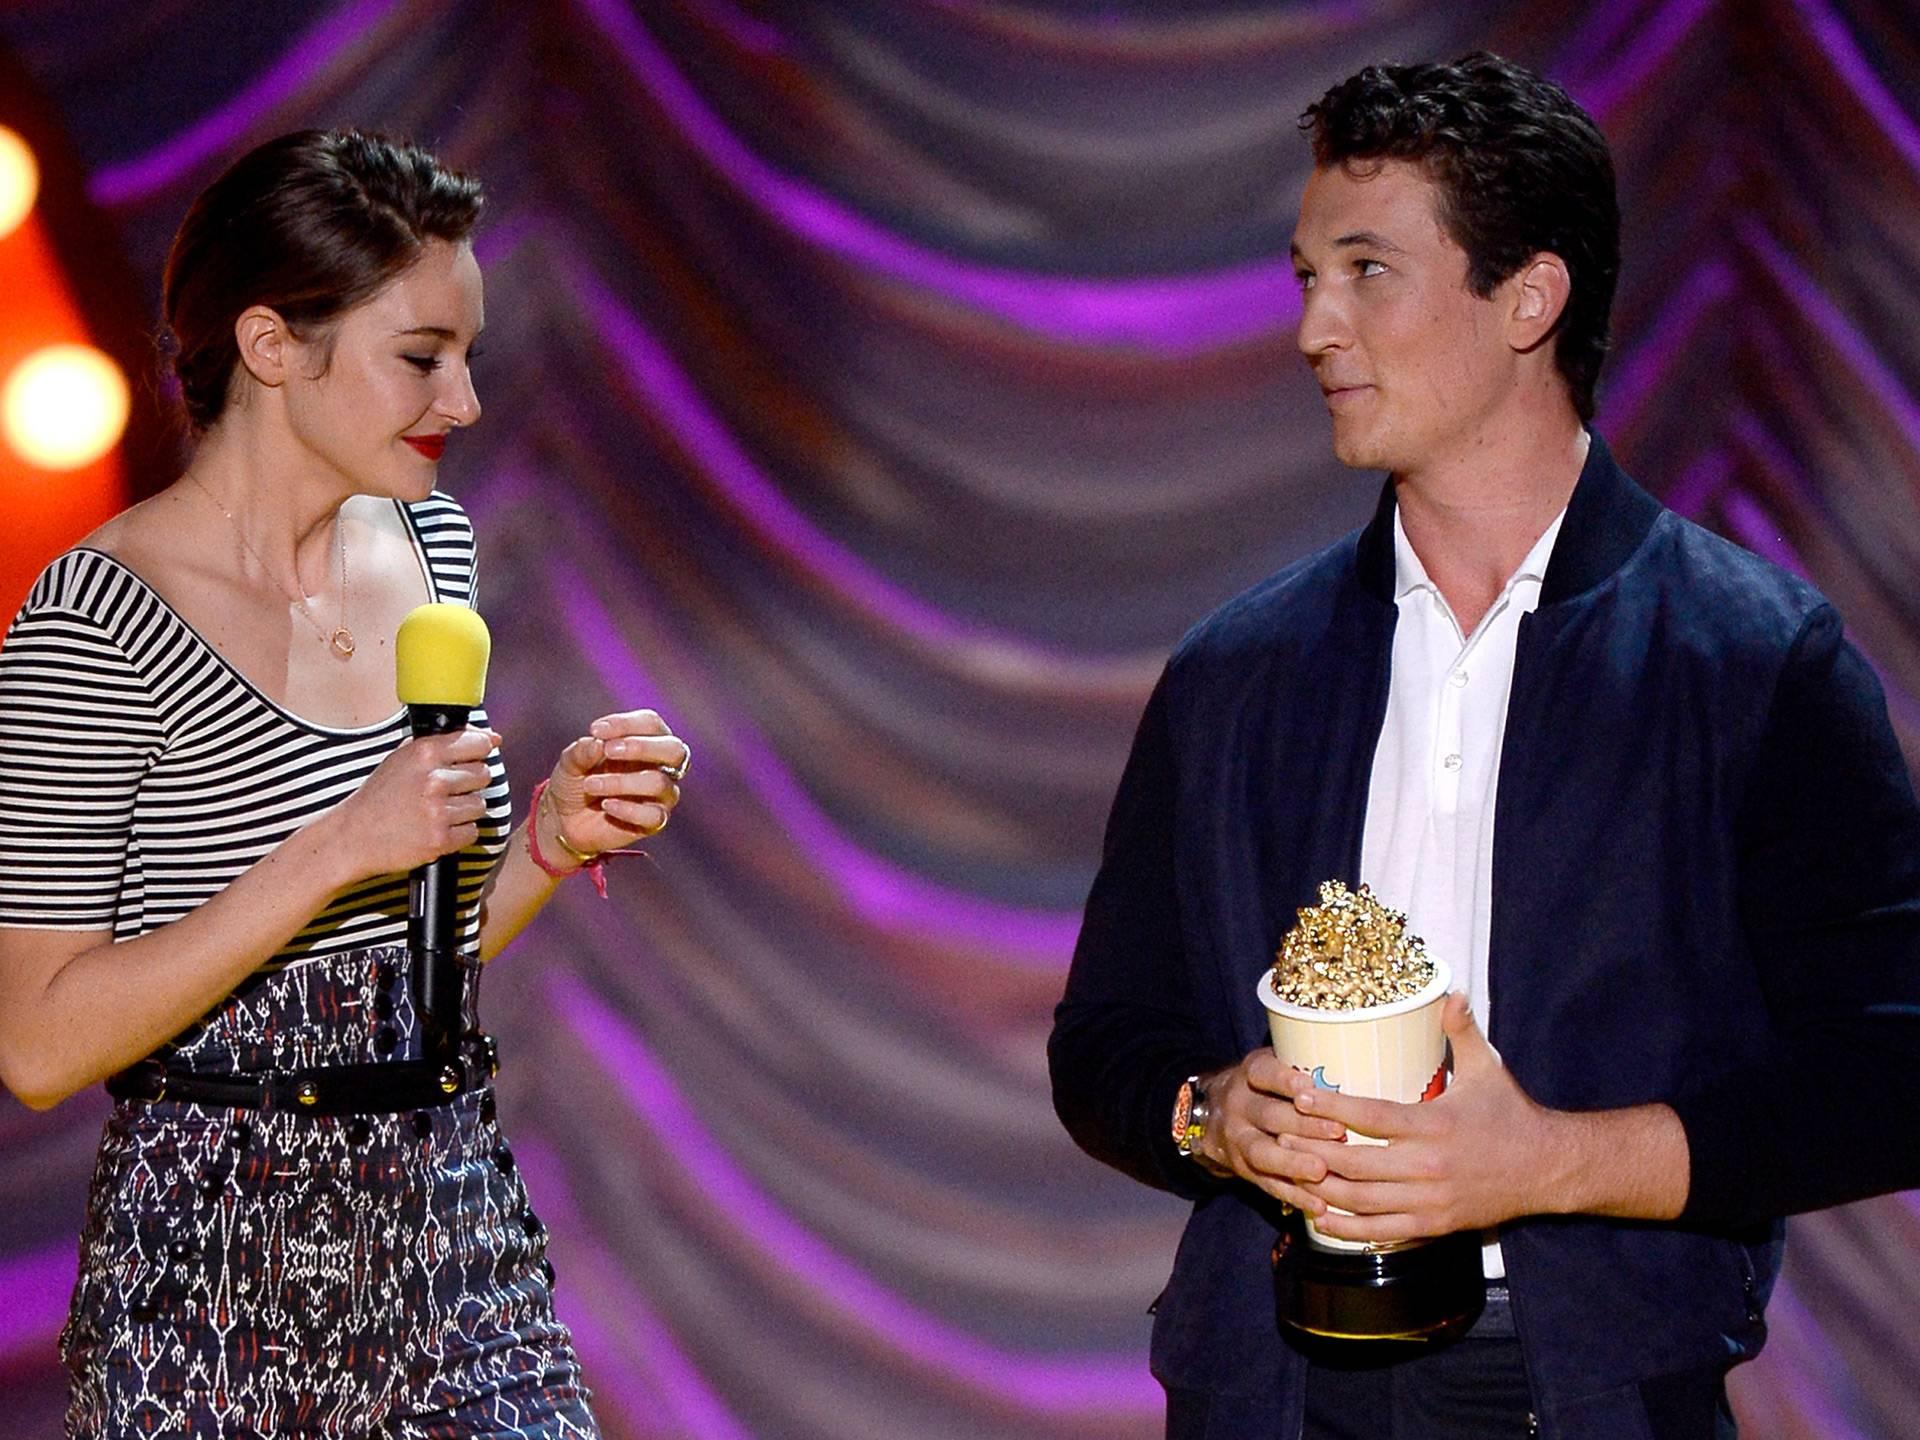 mgid:file:gsp:scenic:/international/mtv-intl/mtv-movie-awards-2015/images/469518190.jpg